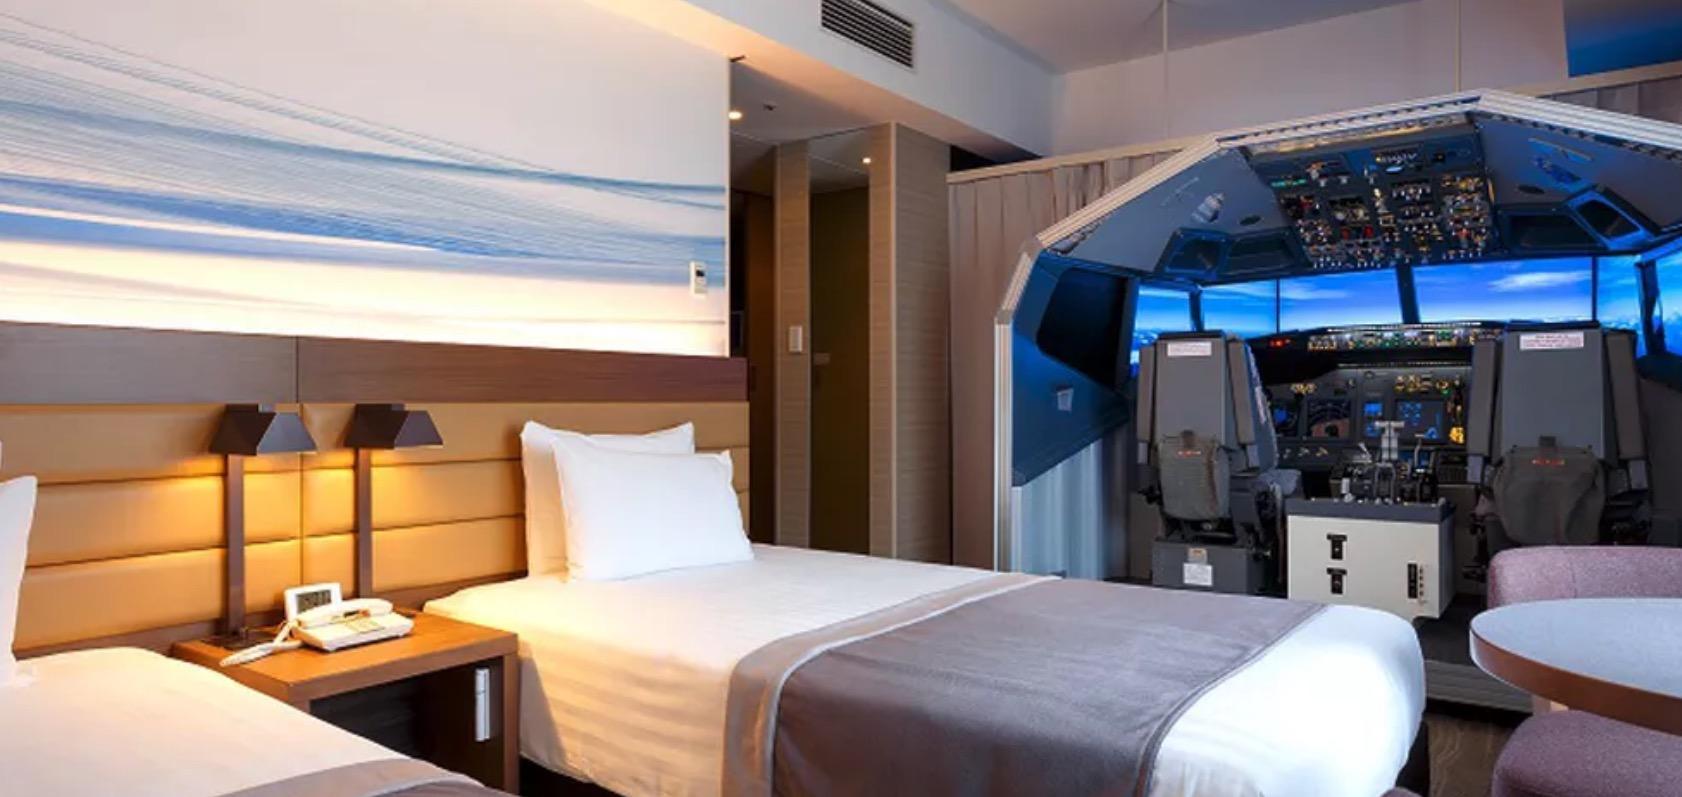 Flysimulator hotell